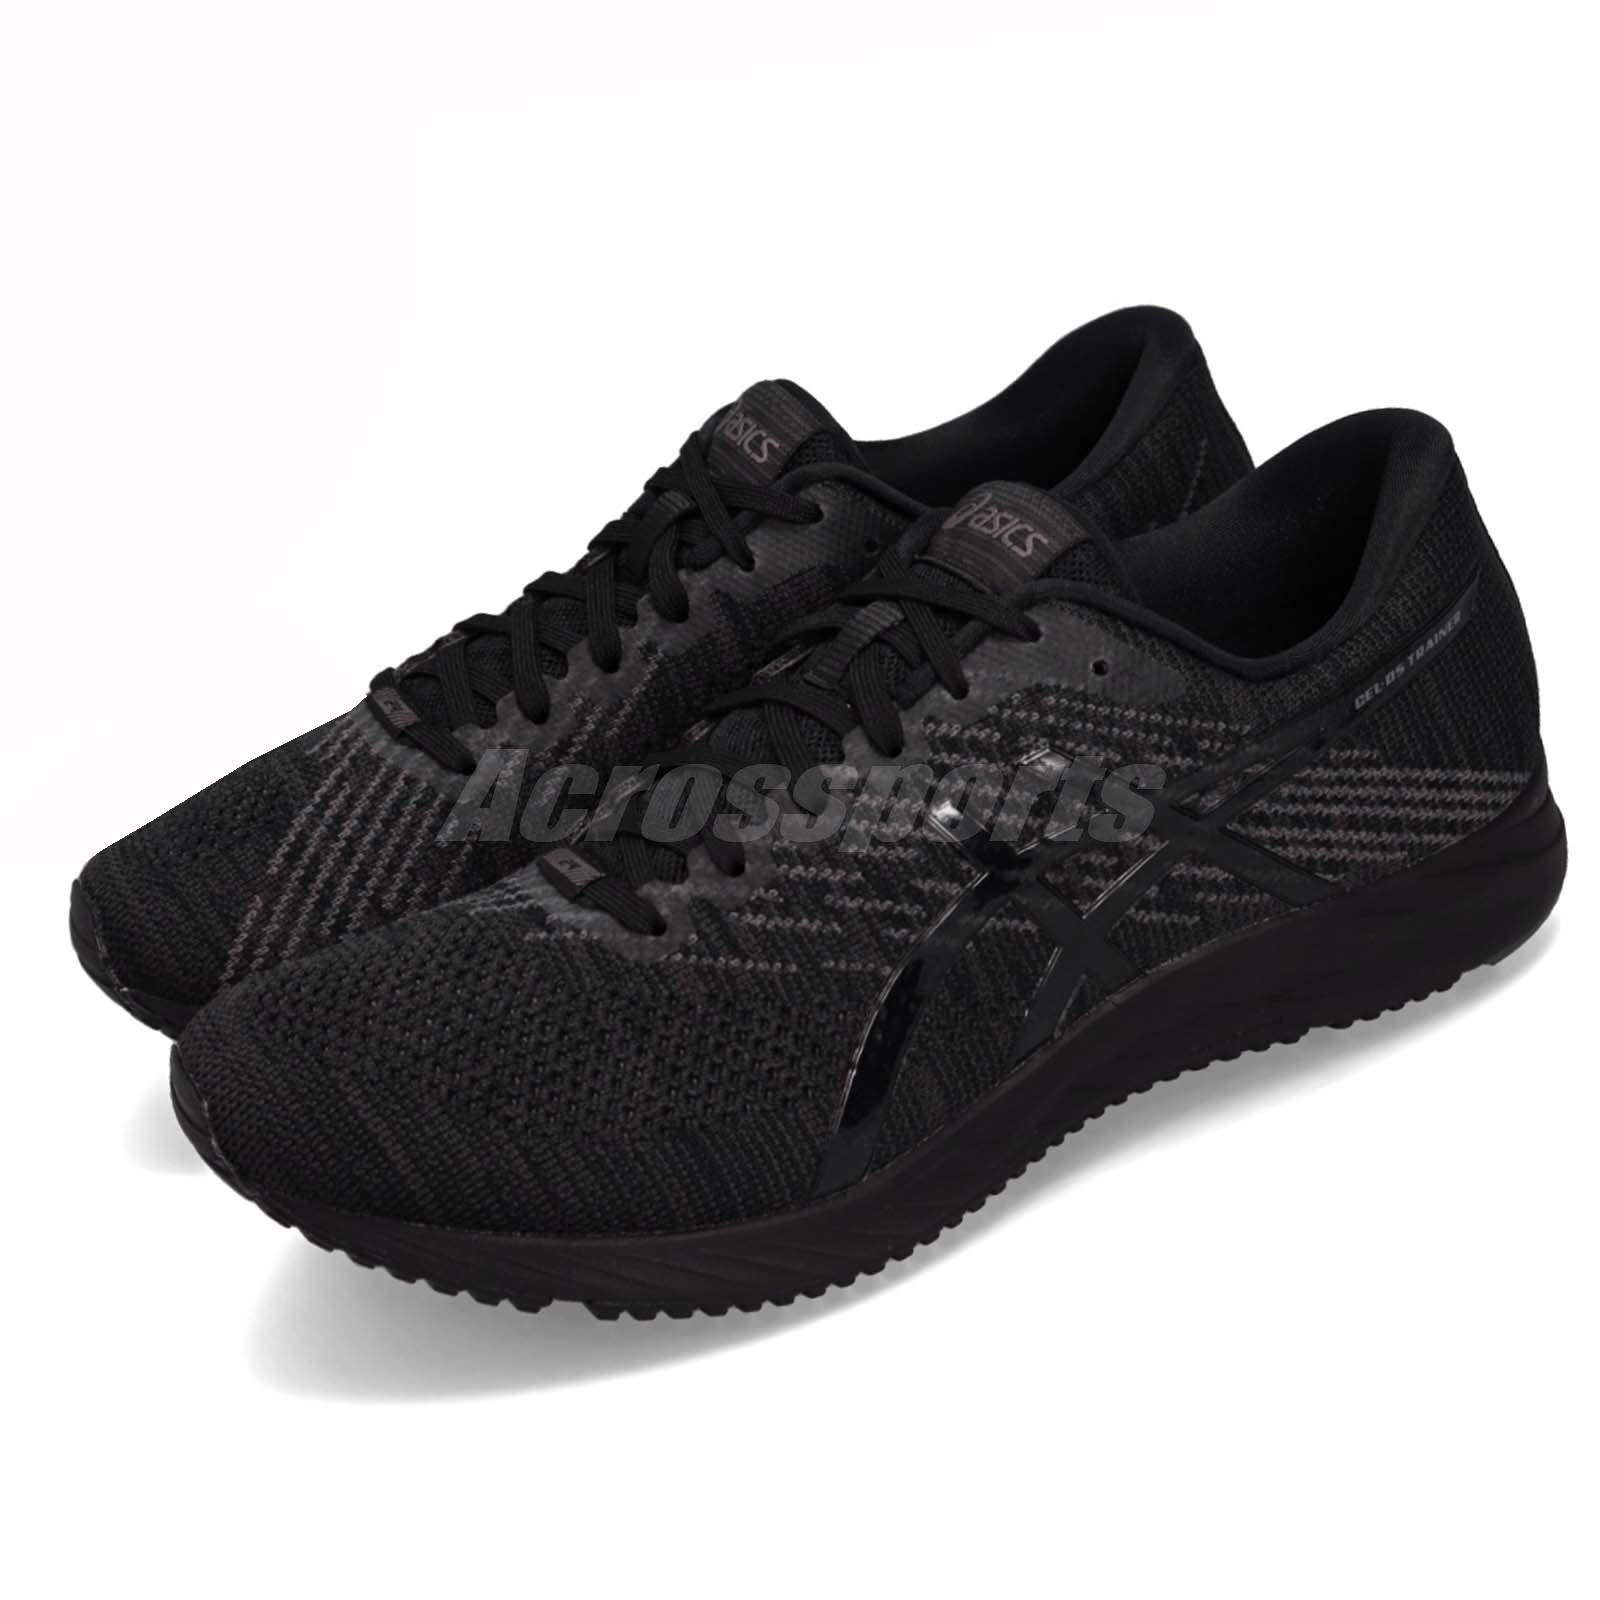 asics training schoenen